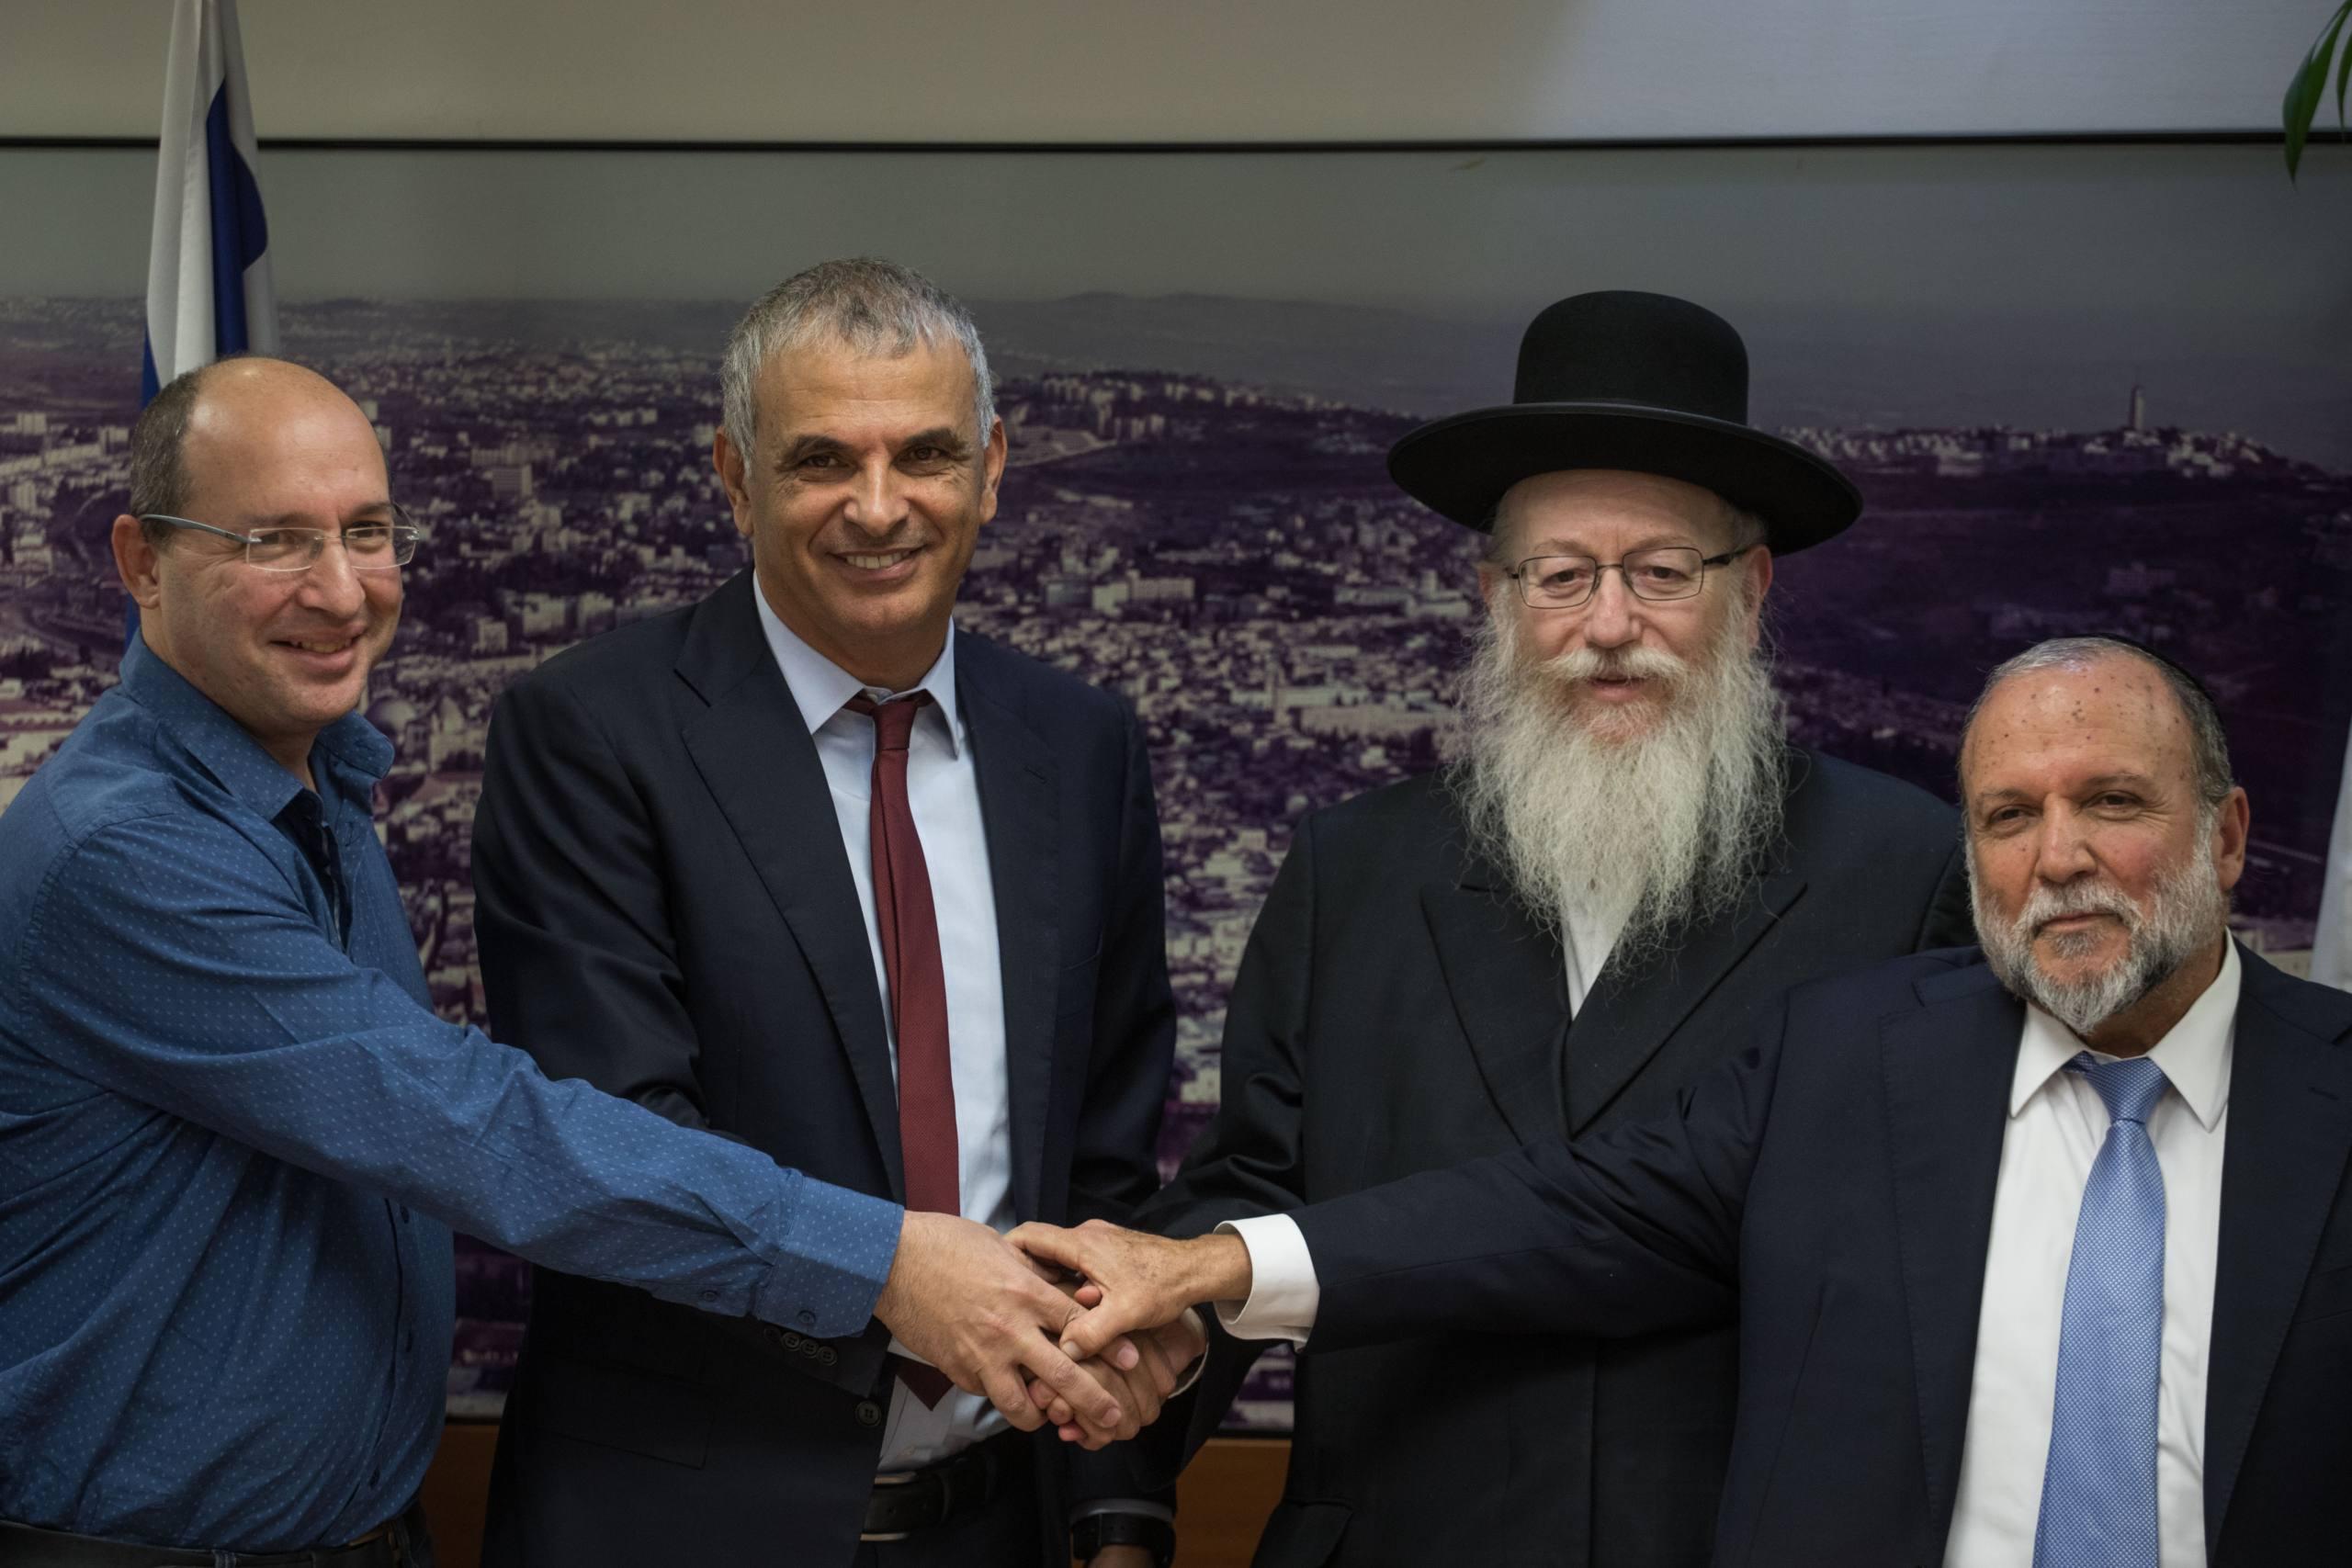 Finance Minister Moshe Kahlon and Health Minister Yaakov Litzman (C), Deputy Health Minister Itzhak Cohen (R), and Histadrut Chairman Avi Nissankoren (L), announce a reform in the budget given to nursing services for the elderly, during a press conference at the Finance Ministry in Jerusalem, on November 20, 2017. Photo by Hadas Parush/Flash90 *** Local Caption *** îùä ëçìåï ùîøã äàåöø ùø äàåöø ú÷öéá ùéøåúéí ñéòåãééí ñéòåã èéôåì æ÷ðéí æé÷ðä ÷ùéùéí éöç÷ ëäï àáé ðéñð÷åøï